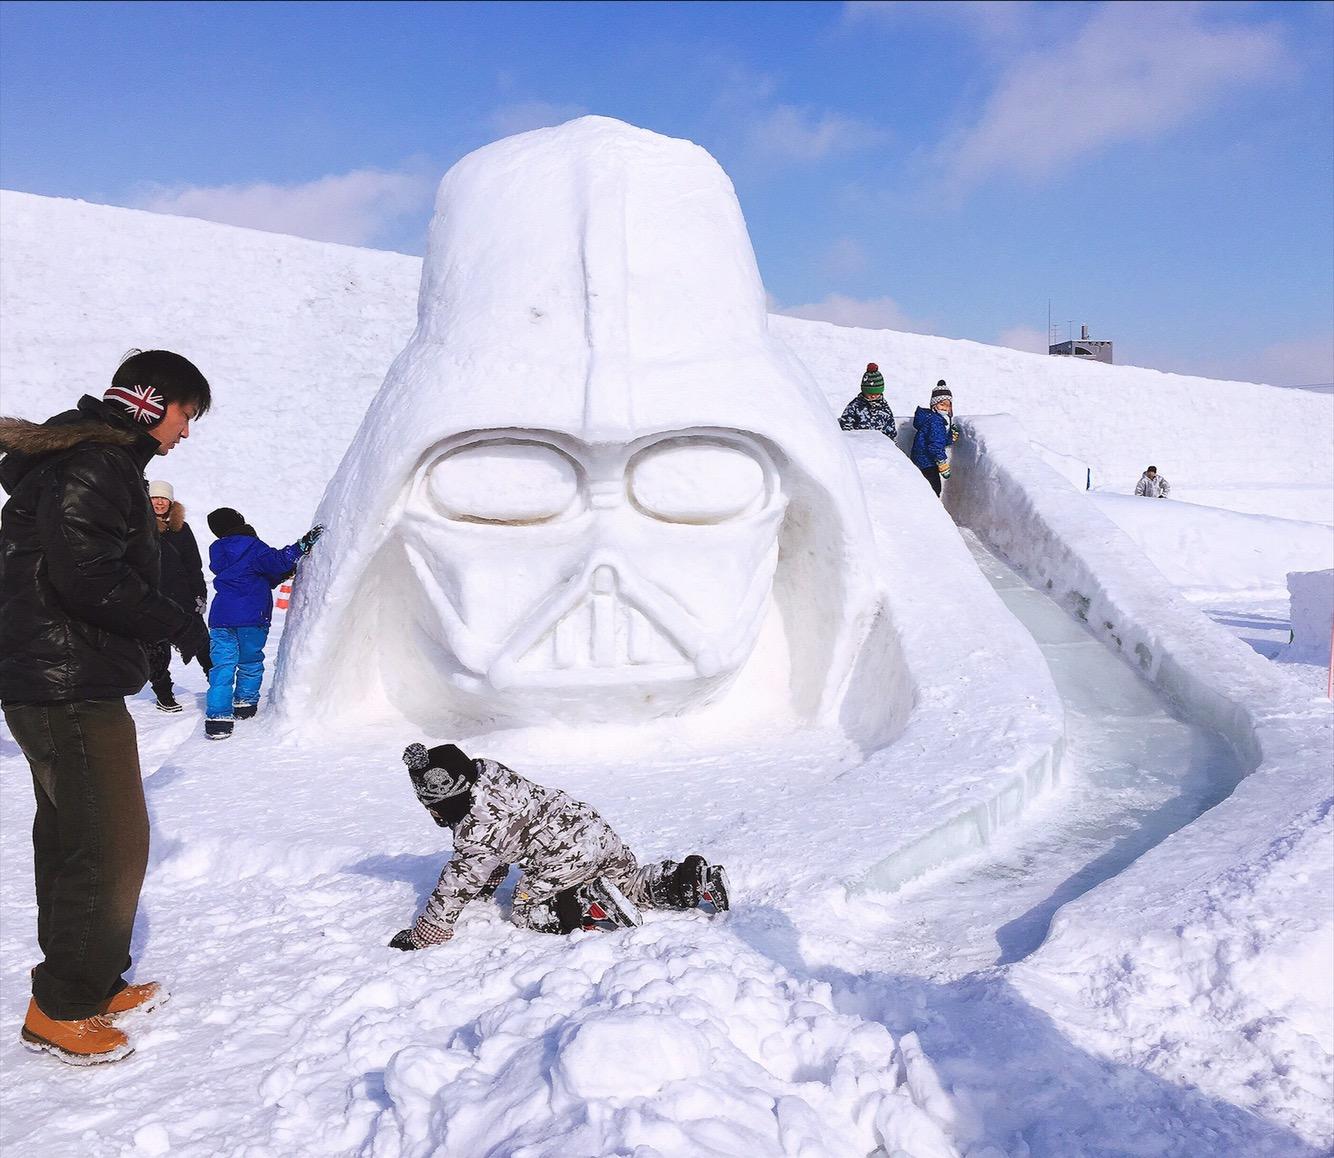 asahikawa winter festival japan snow festivals come. Black Bedroom Furniture Sets. Home Design Ideas